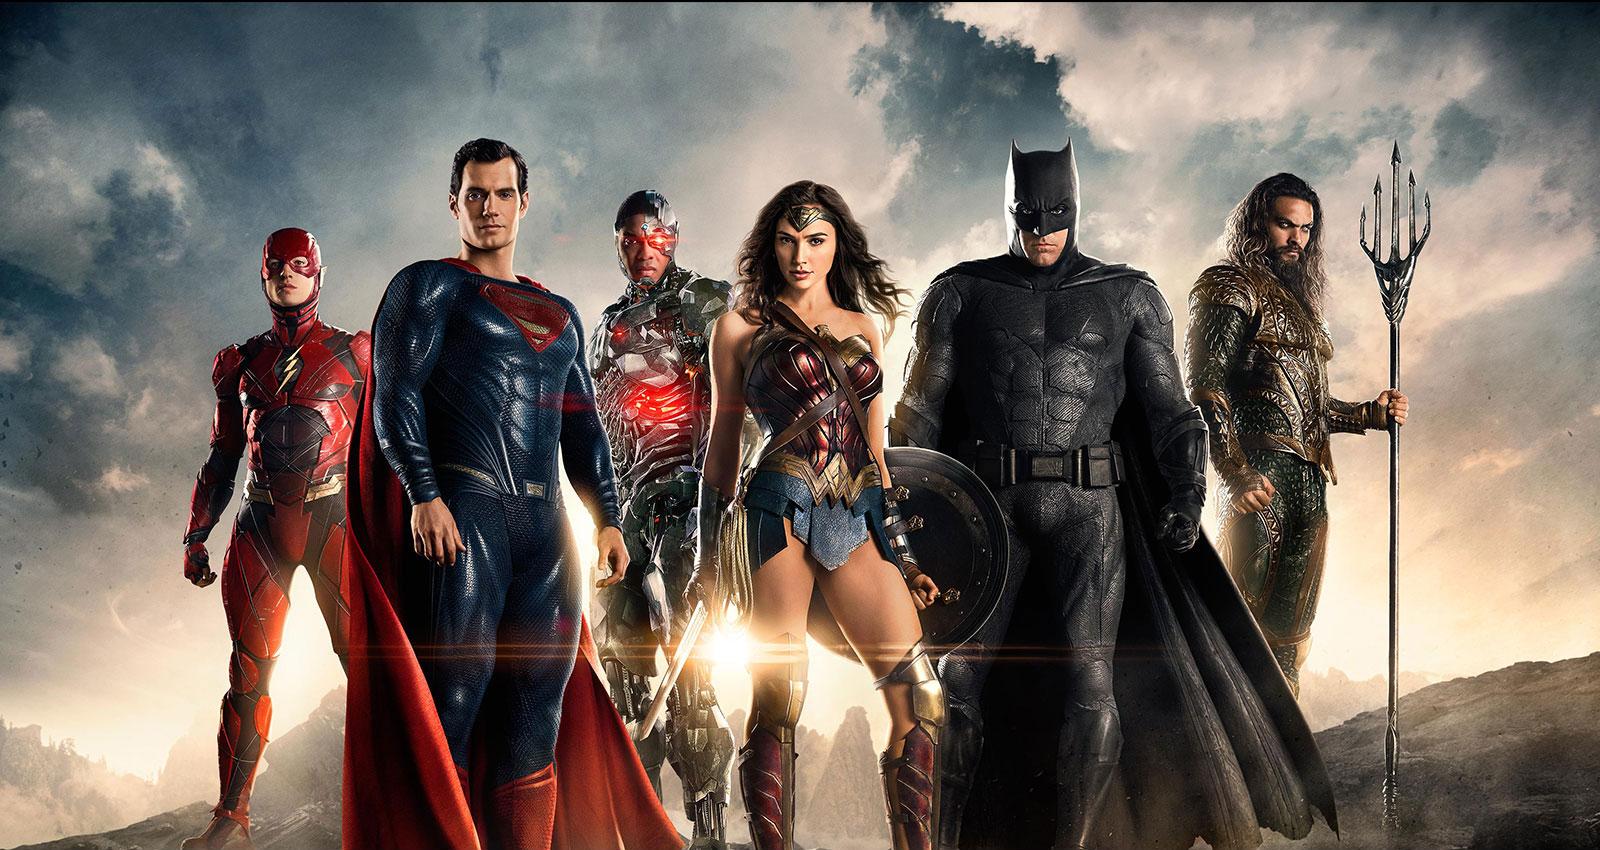 Steppenwolf vs. Super Friends: Comic-Con-Trailer zur Justice League